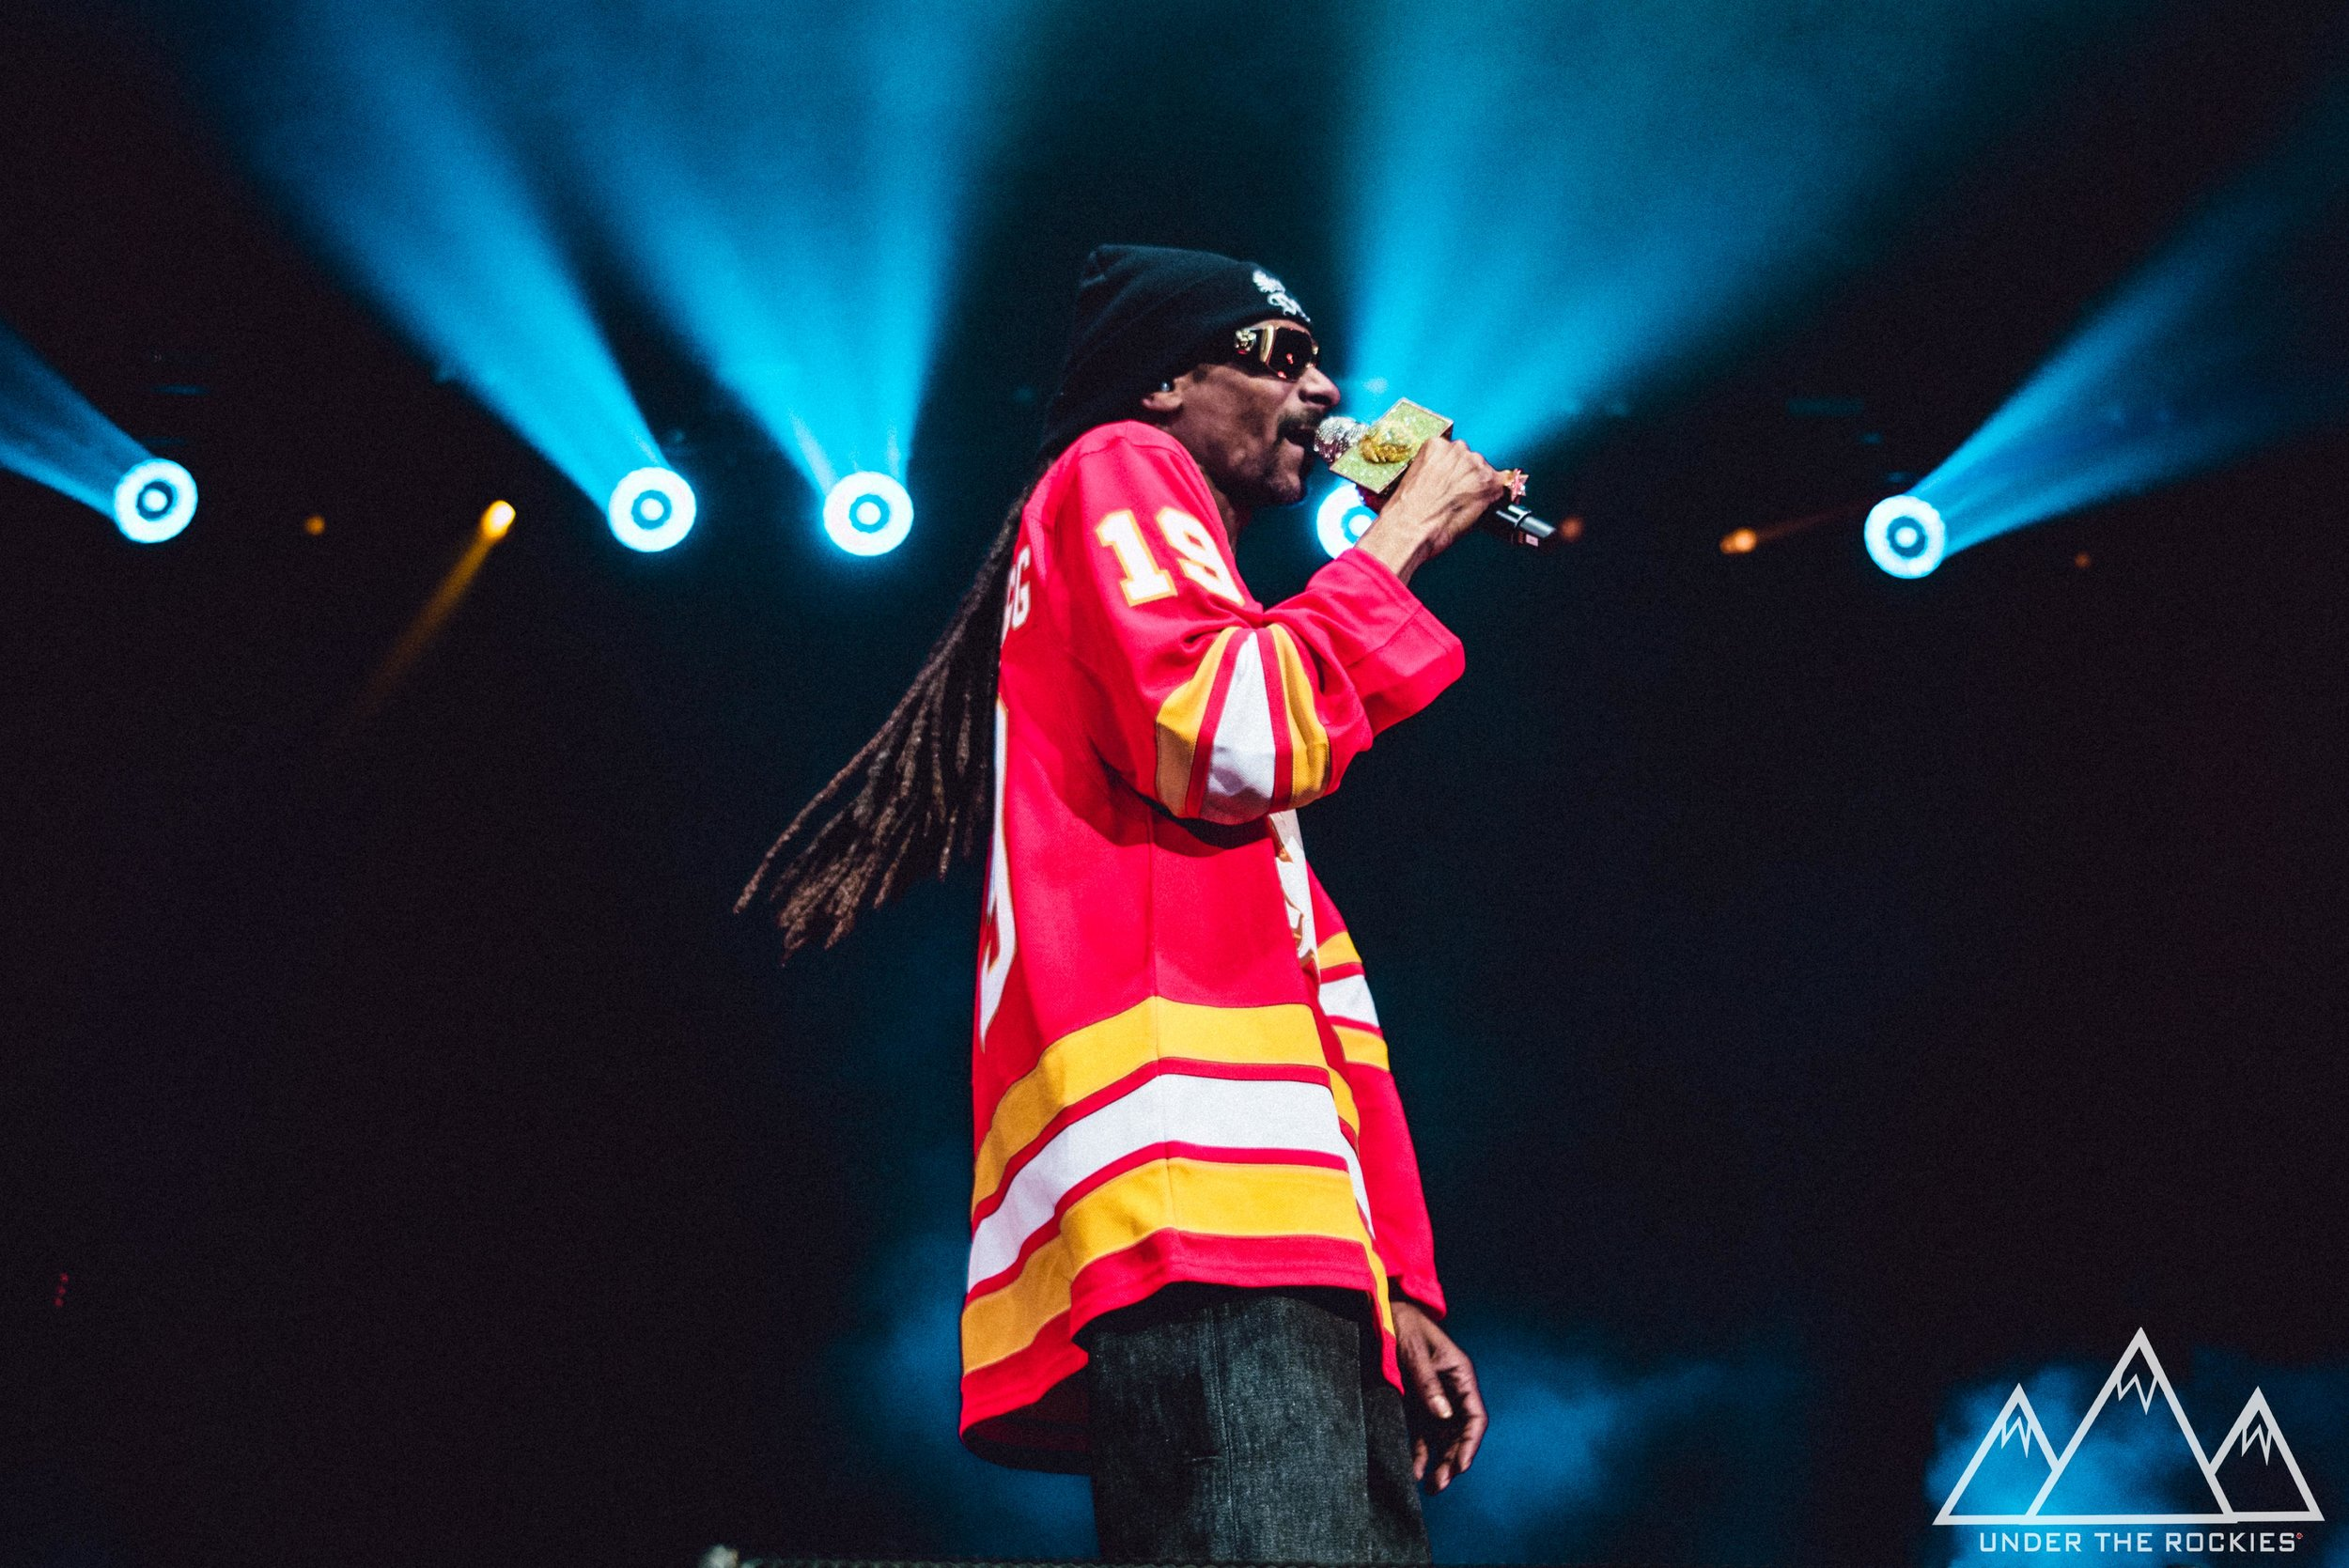 SnoopDogg-13-JJP-20190221.jpg